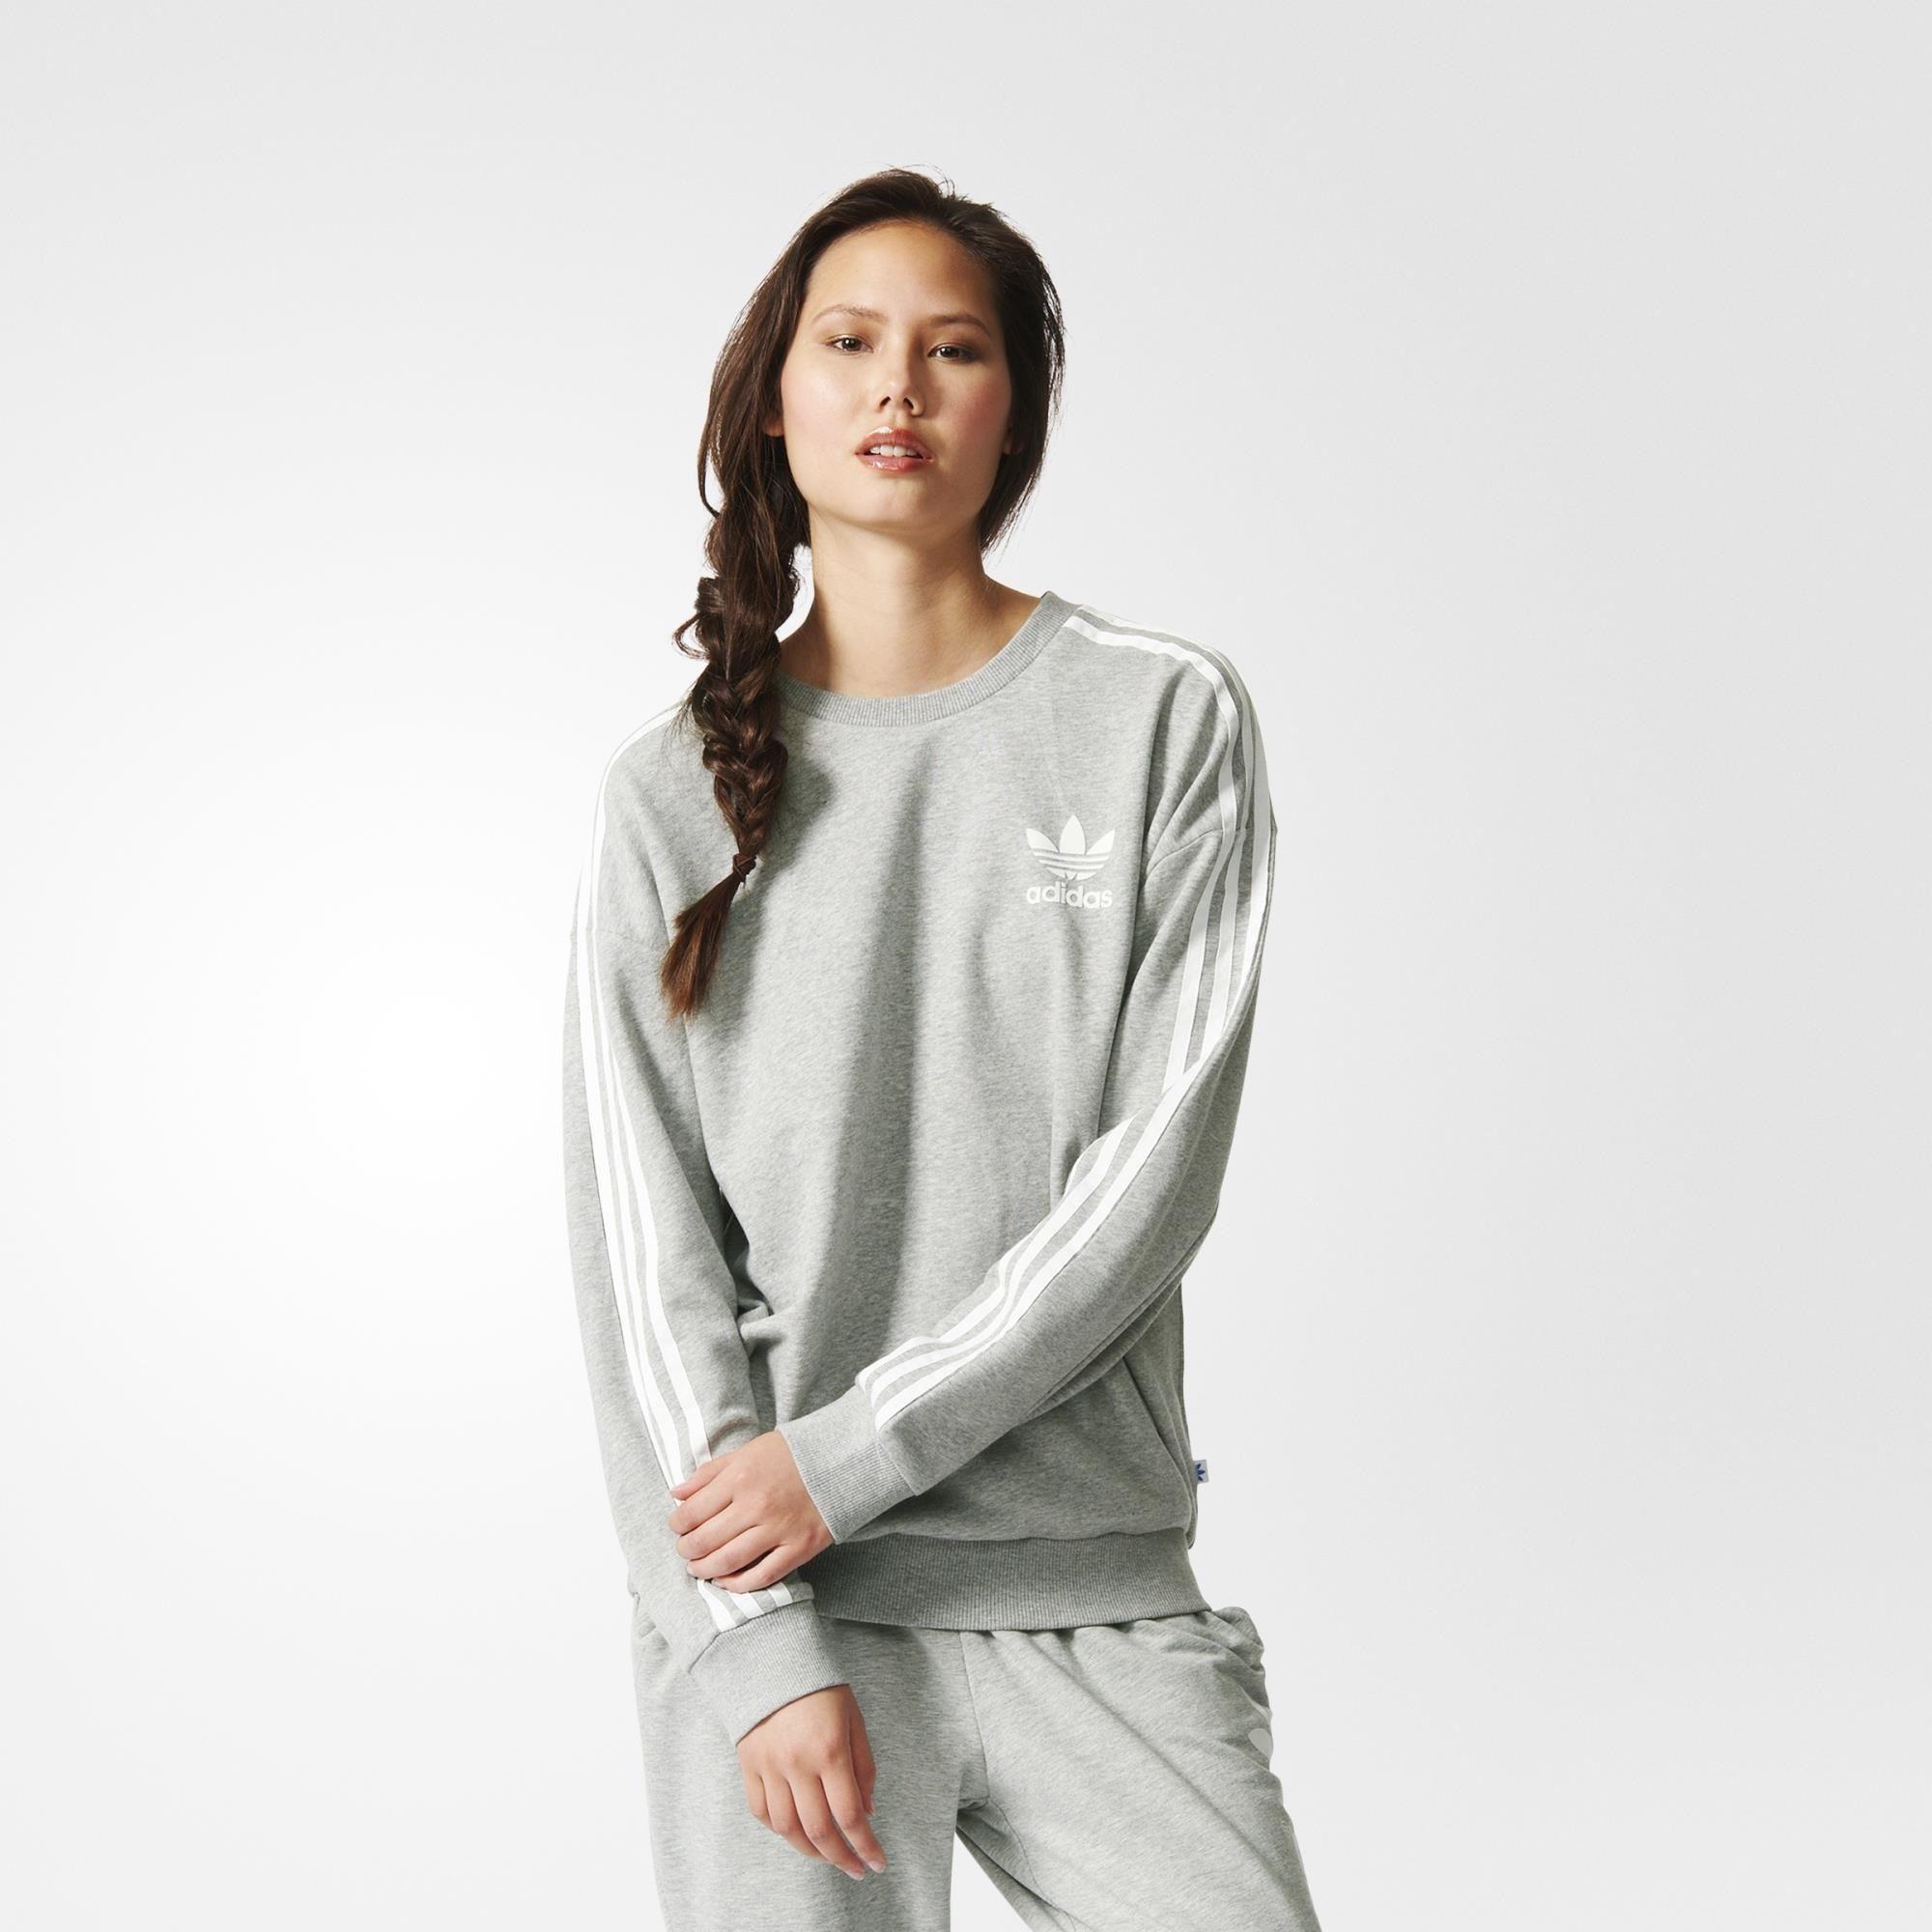 Adidas beckenbauer sweatshirt grey adidas us online hopping